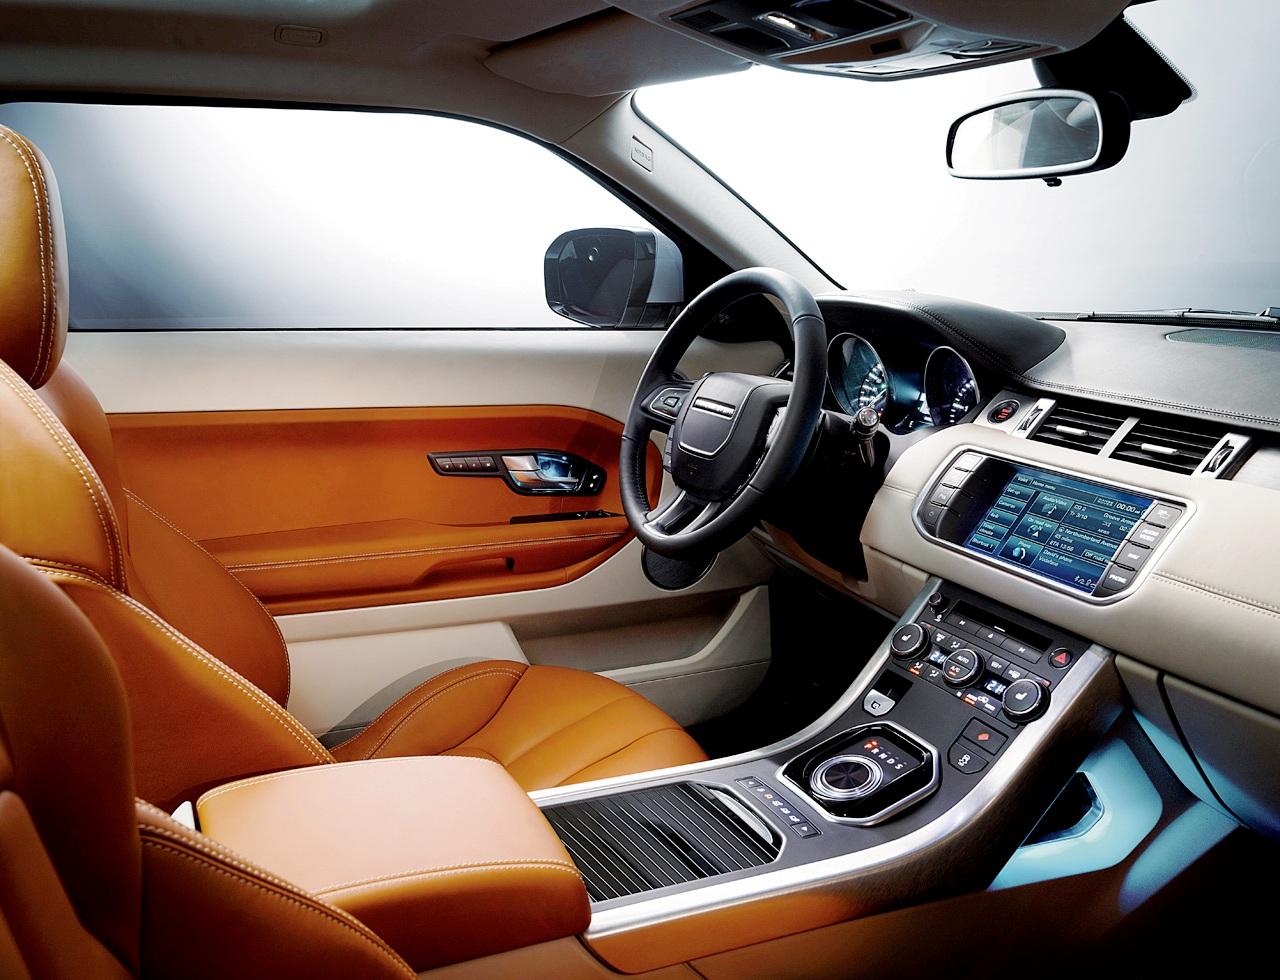 http://4.bp.blogspot.com/-ocyVh1AwFFg/TnNWPdGhOyI/AAAAAAAAEd4/B8io6gUFIag/s1600/2012-Range-Rover-Evoque-Victoria-Beckham-Edition%2B%25252816%252529.jpg